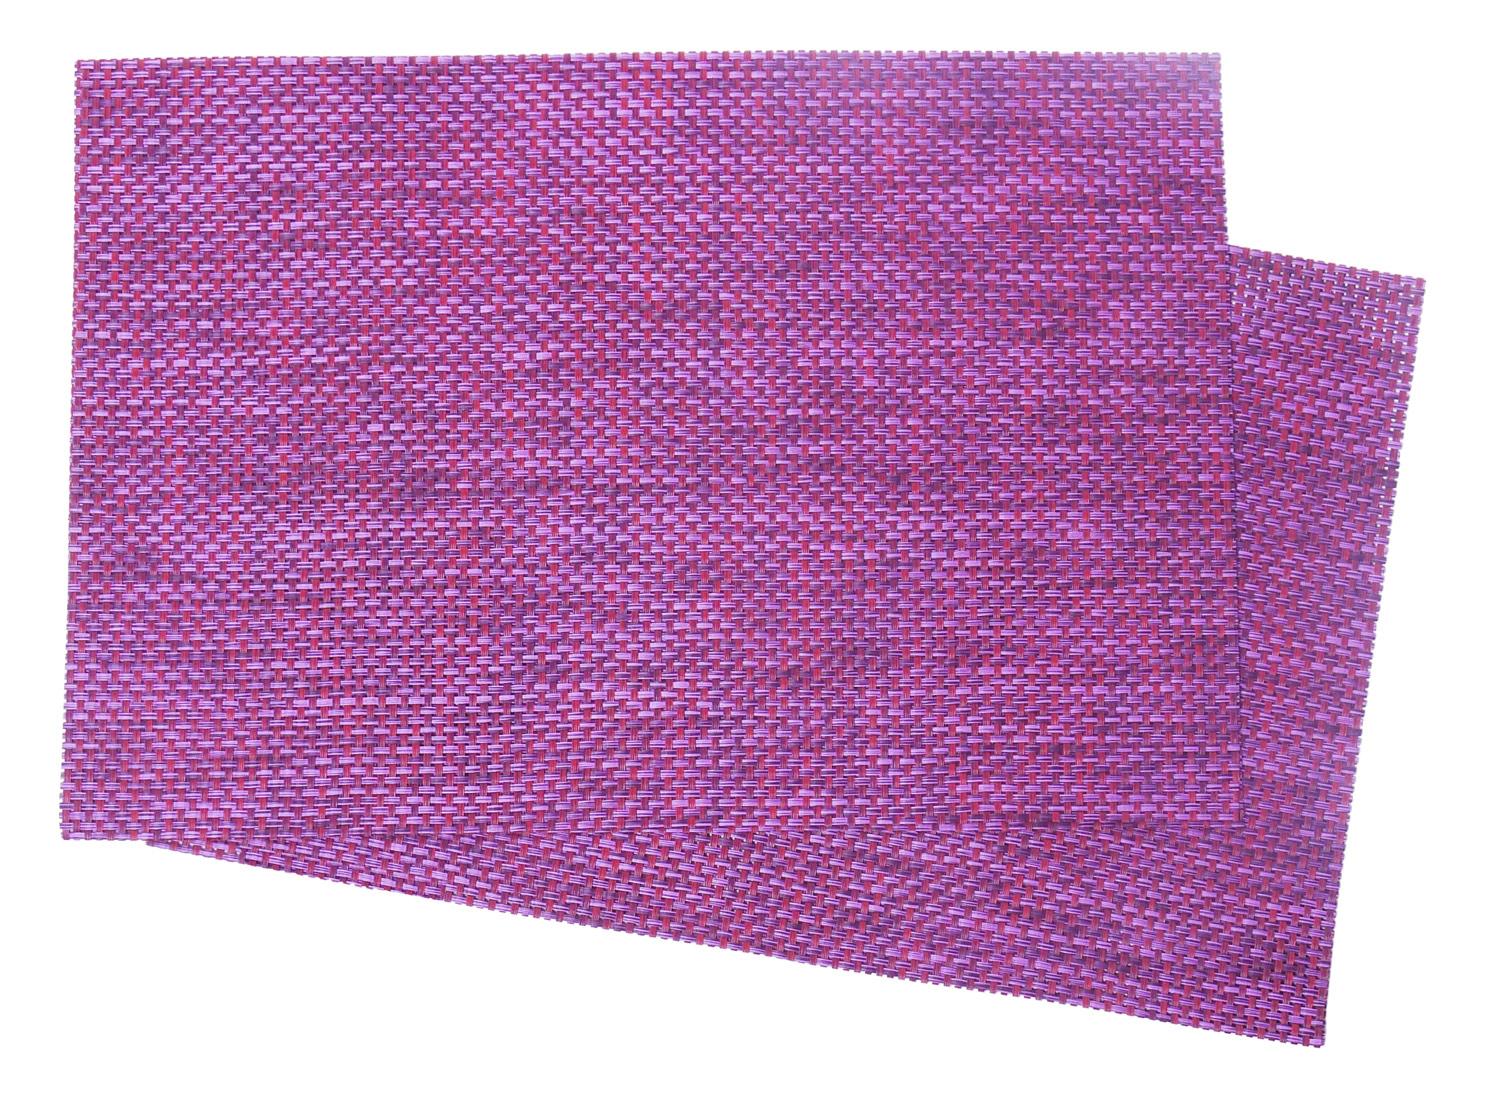 Image of Woven Vinyl Placemat, Purple Heather MAT30